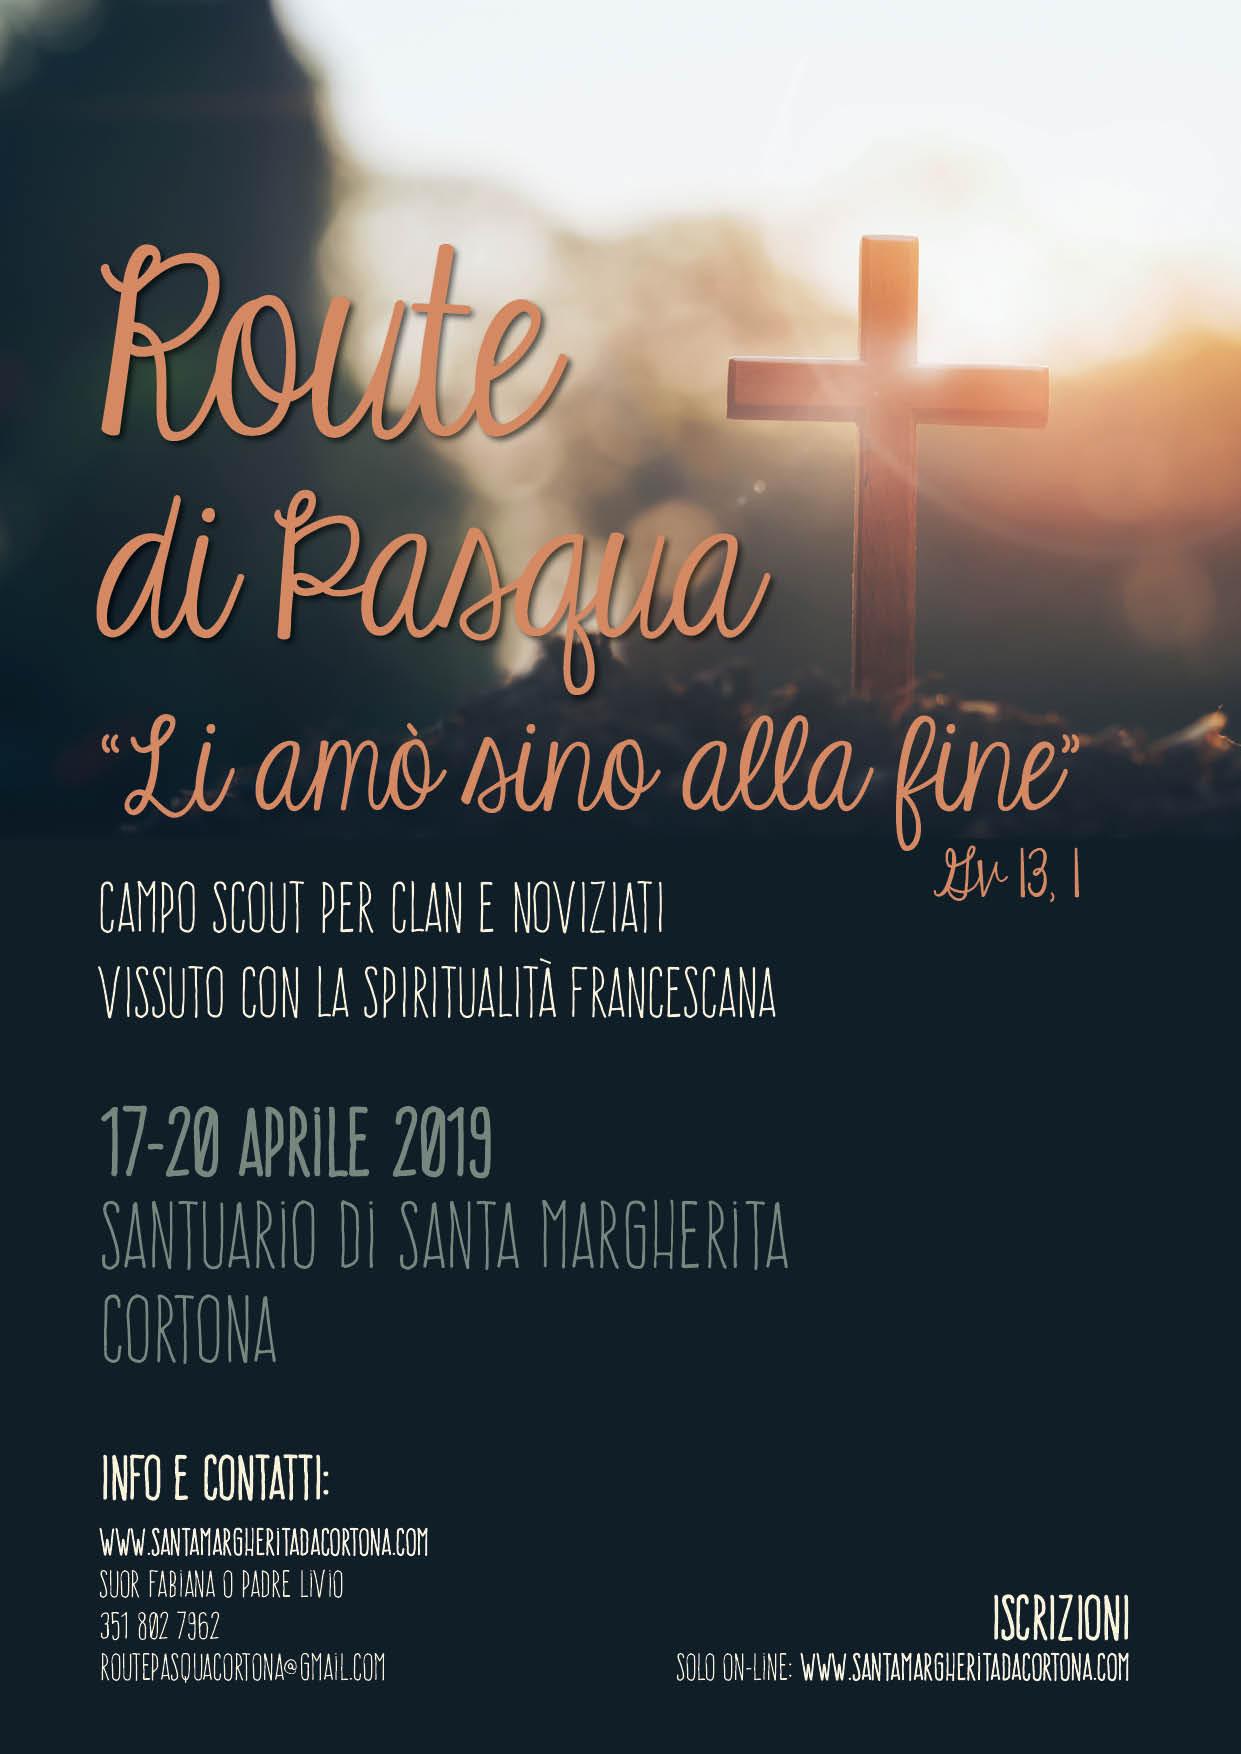 esperienza di fede con i frati francescani di Santa Margherita di Cortona per clan e noviziati scout agesci